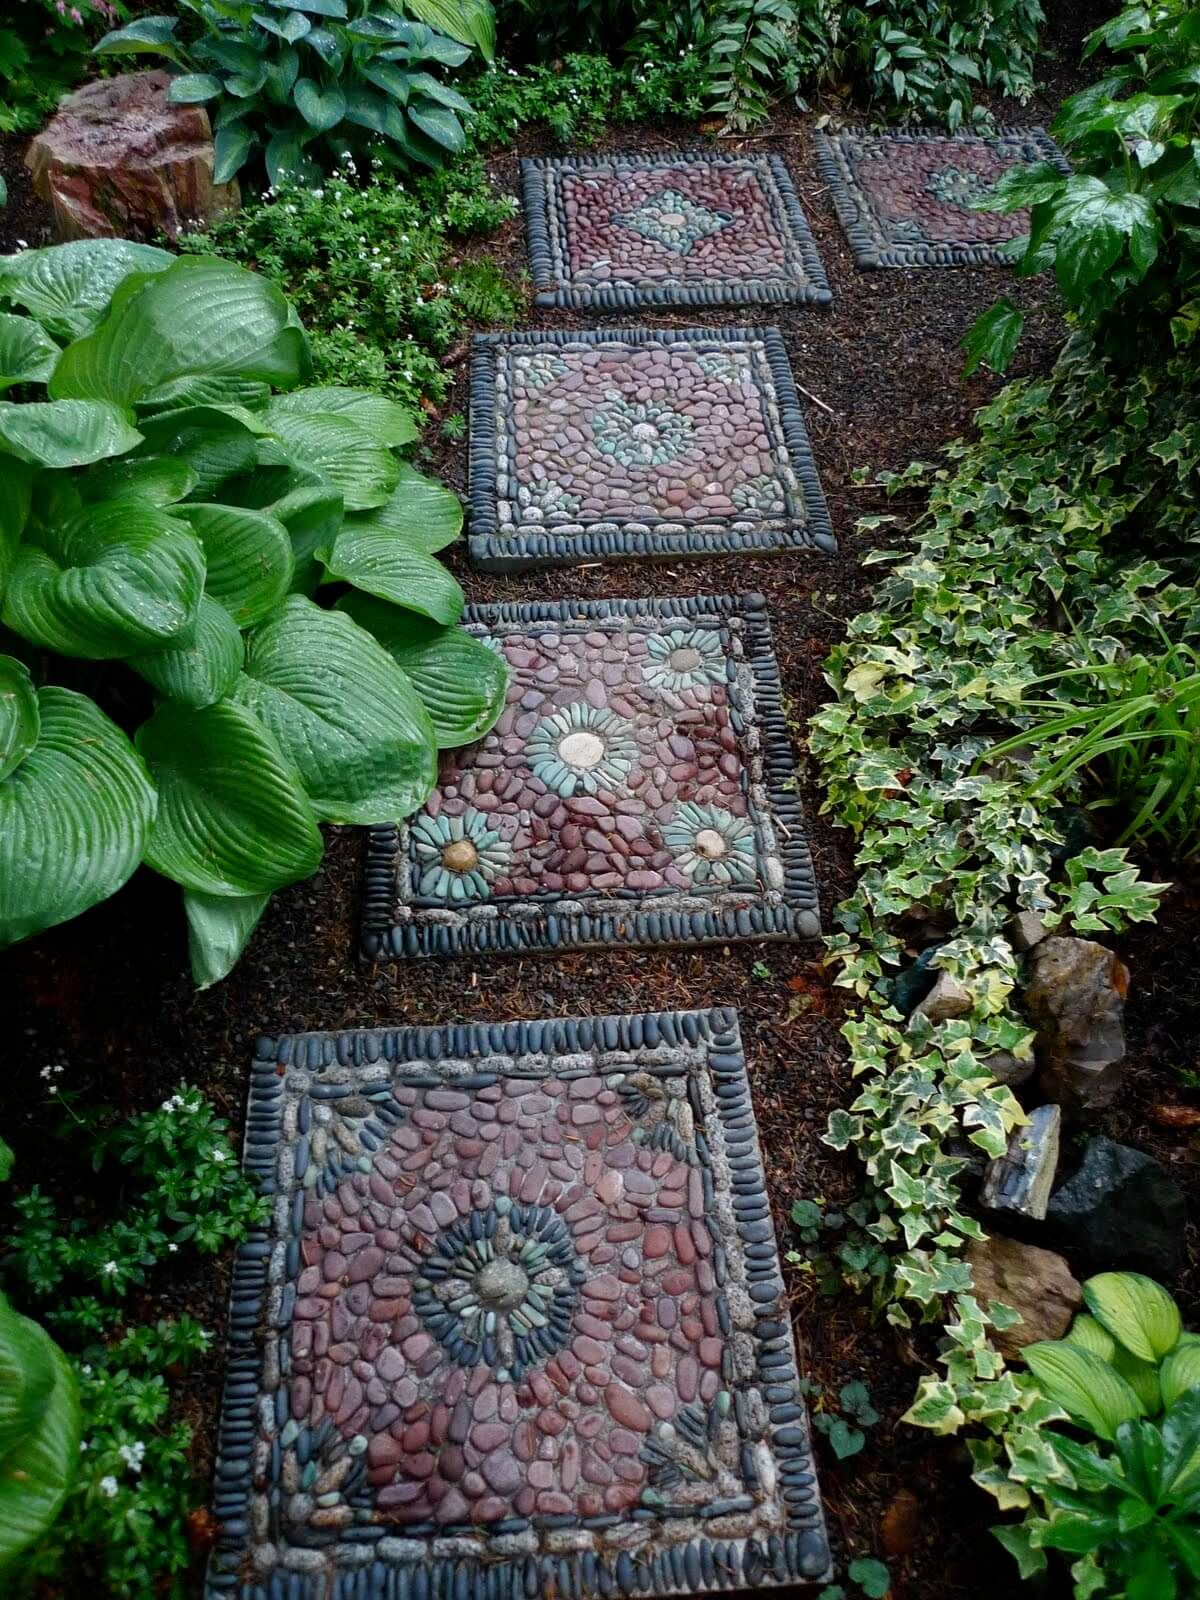 Homemade garden art ideas - 28 Pretty Diy Mosaic Decorations For Your Garden